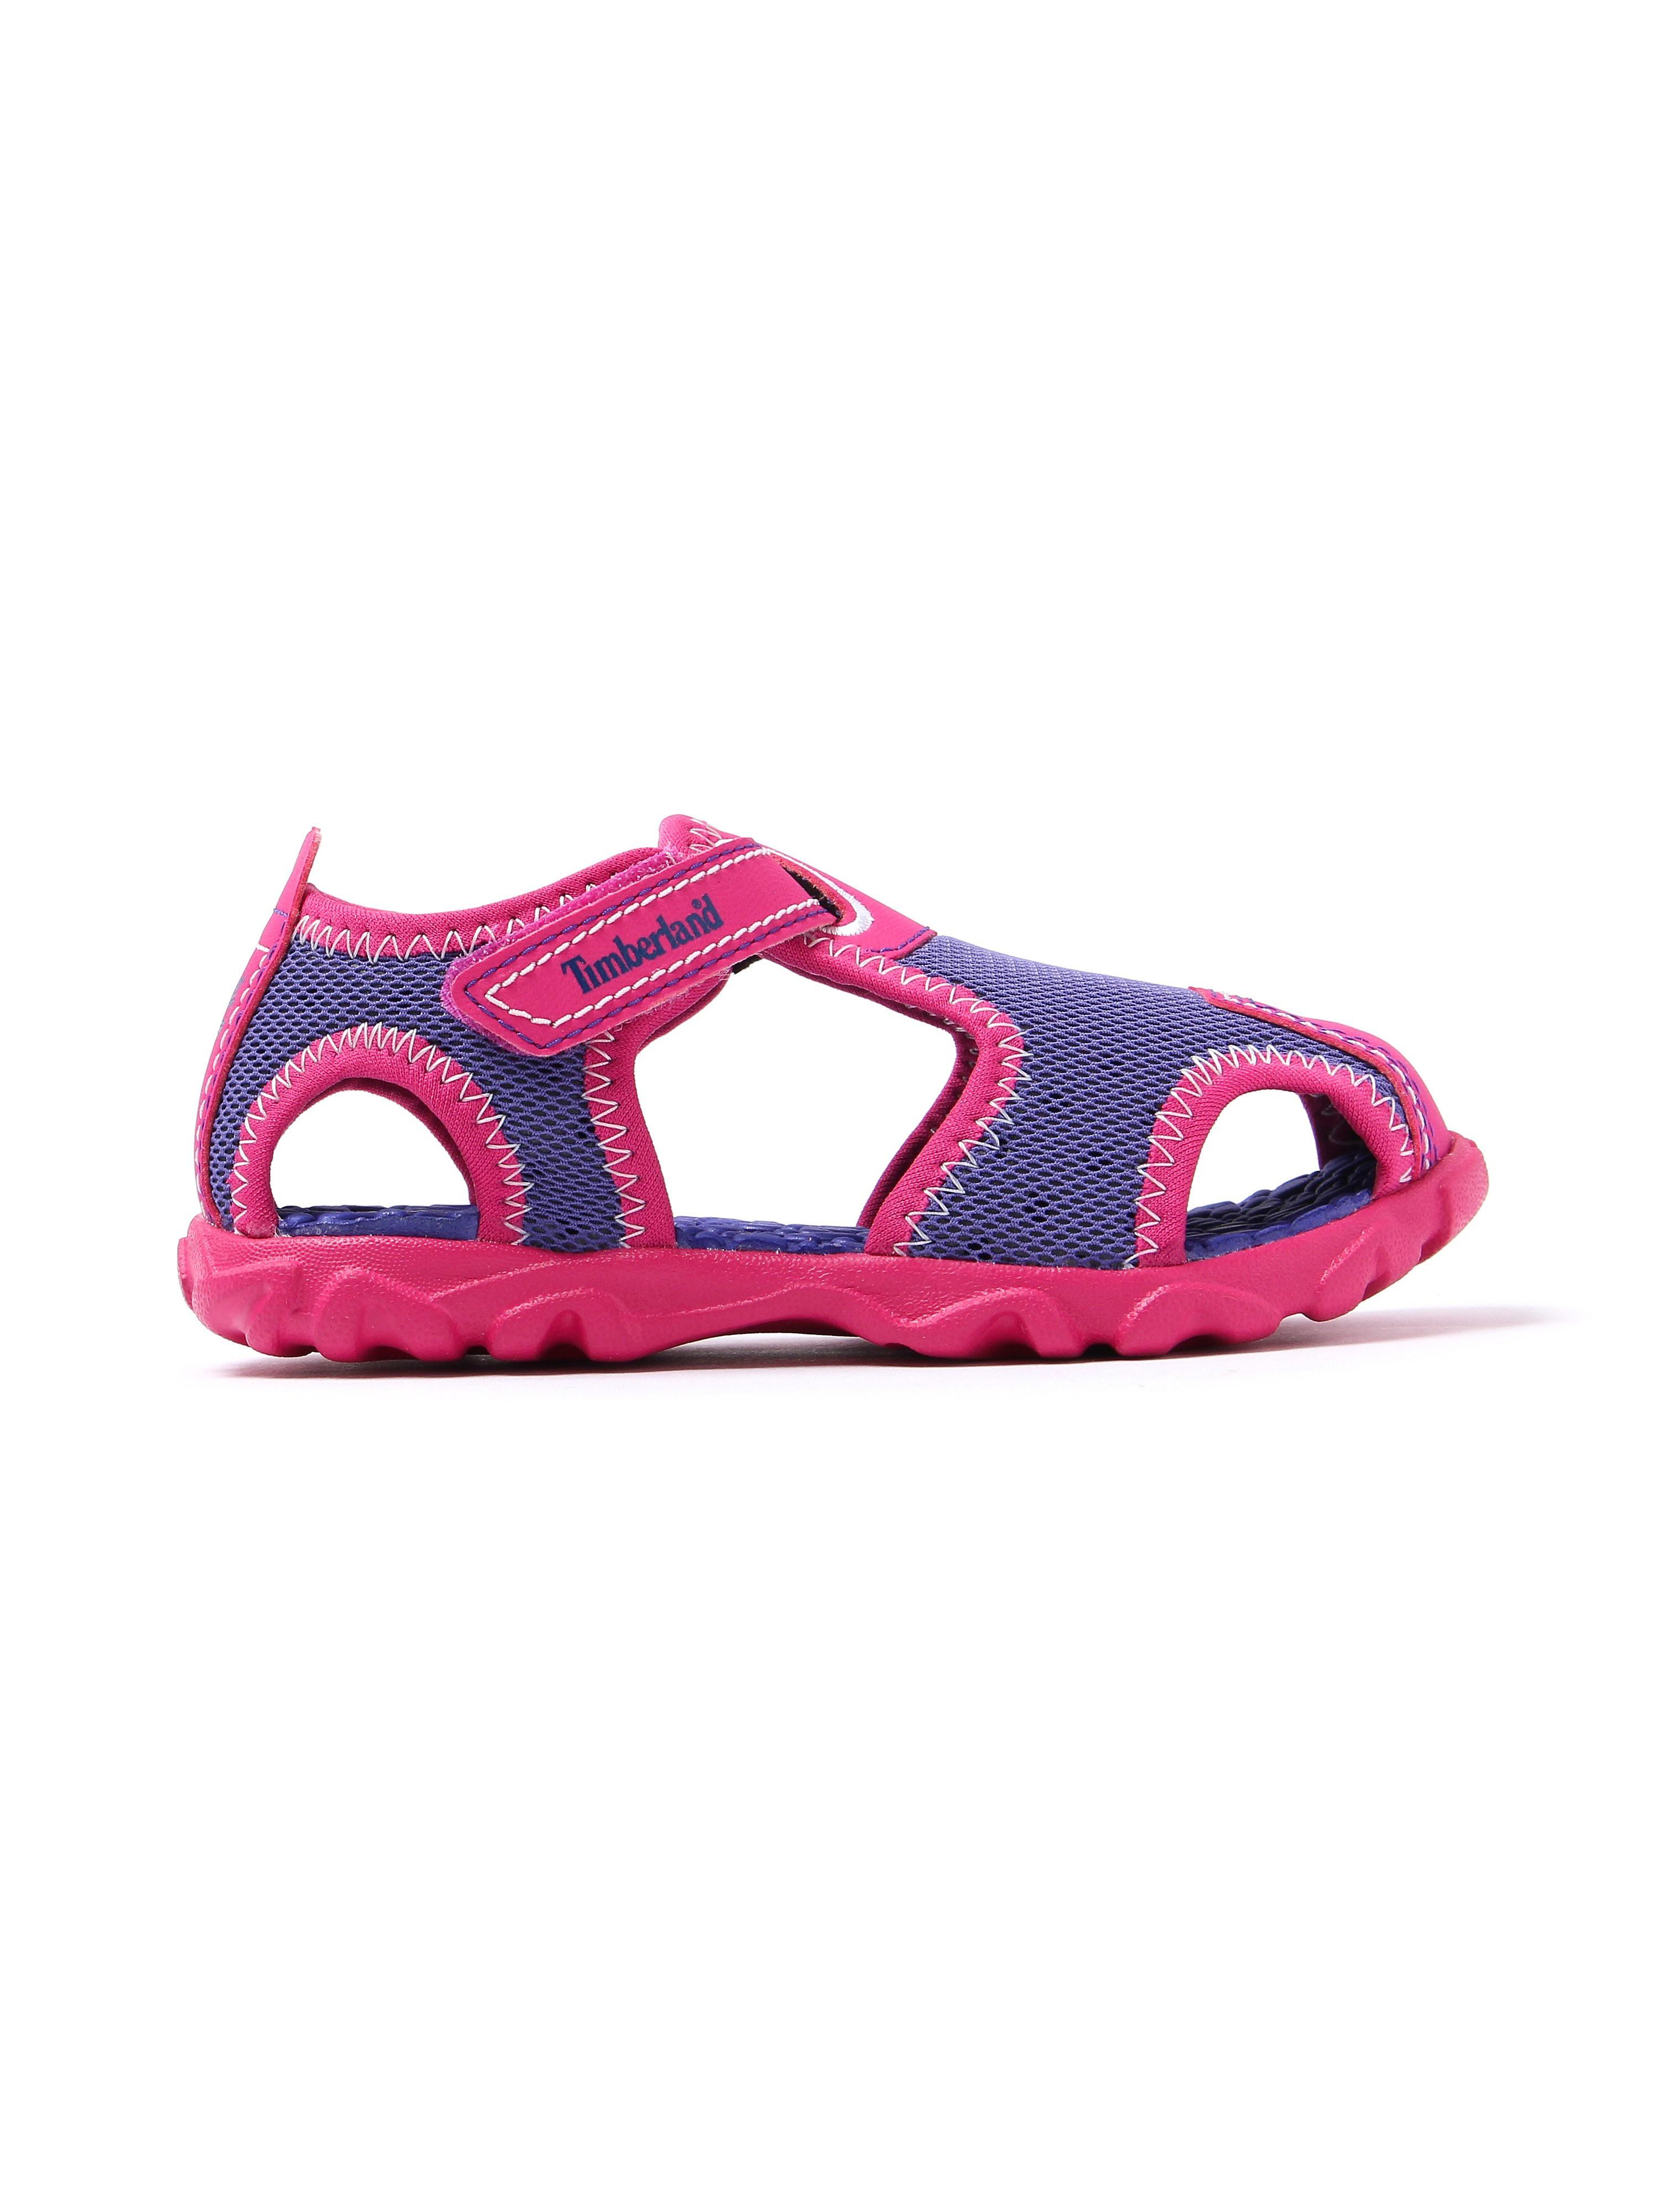 Timberland Infant Splashtown Fisherman Sandals - Purple & Pink